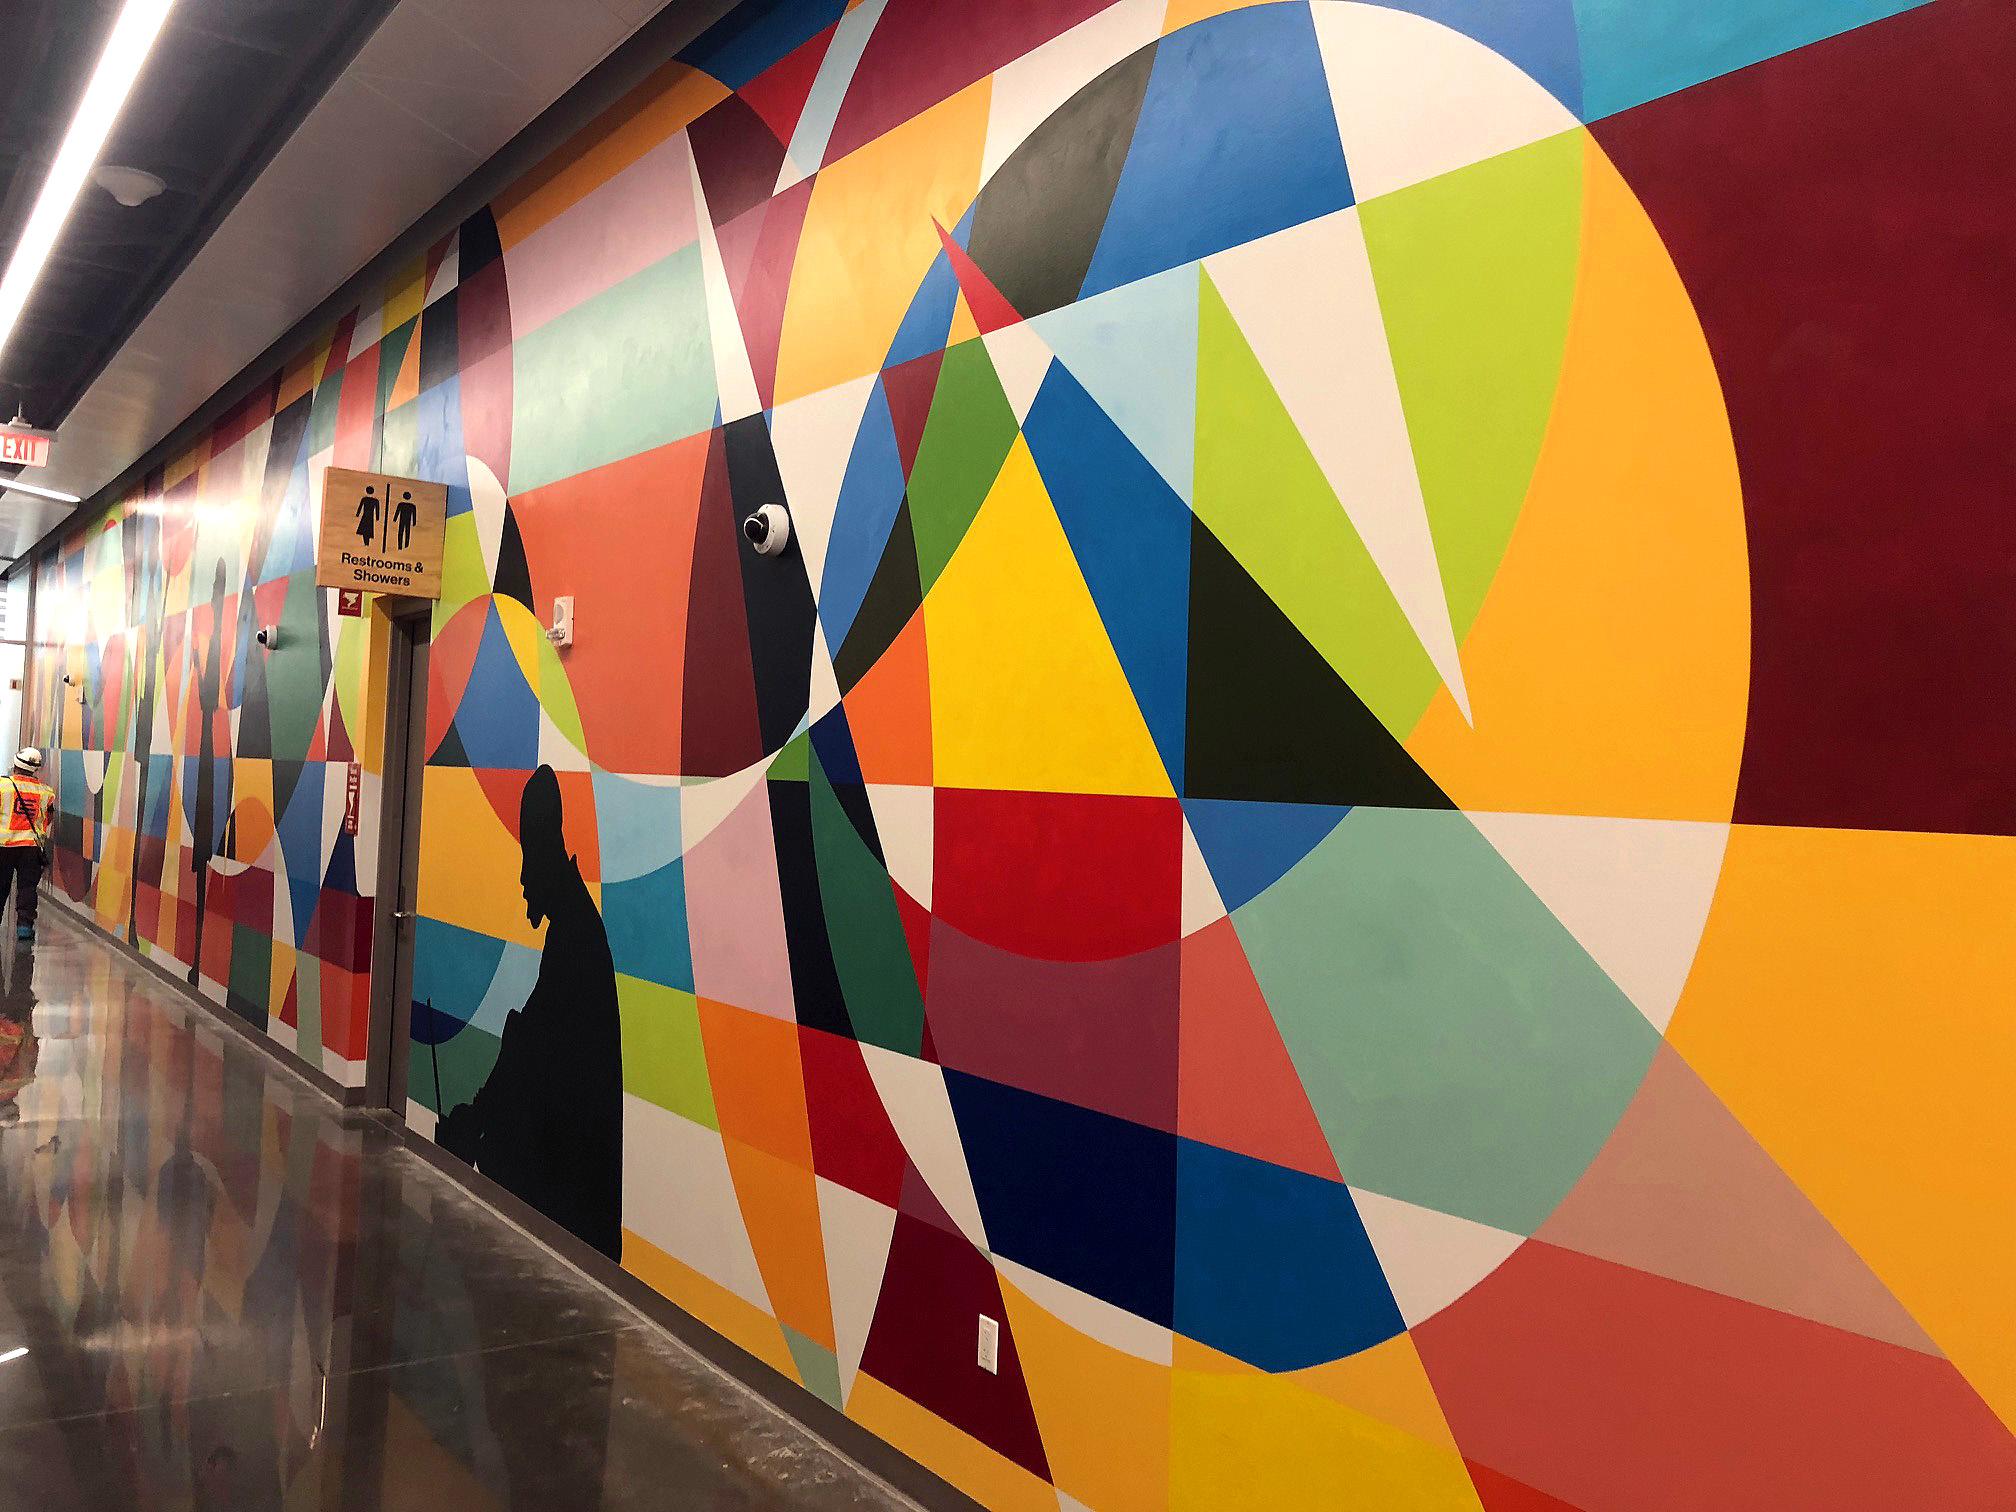 2018 mural commission for Facebook's data center in Altoona, Iowa.